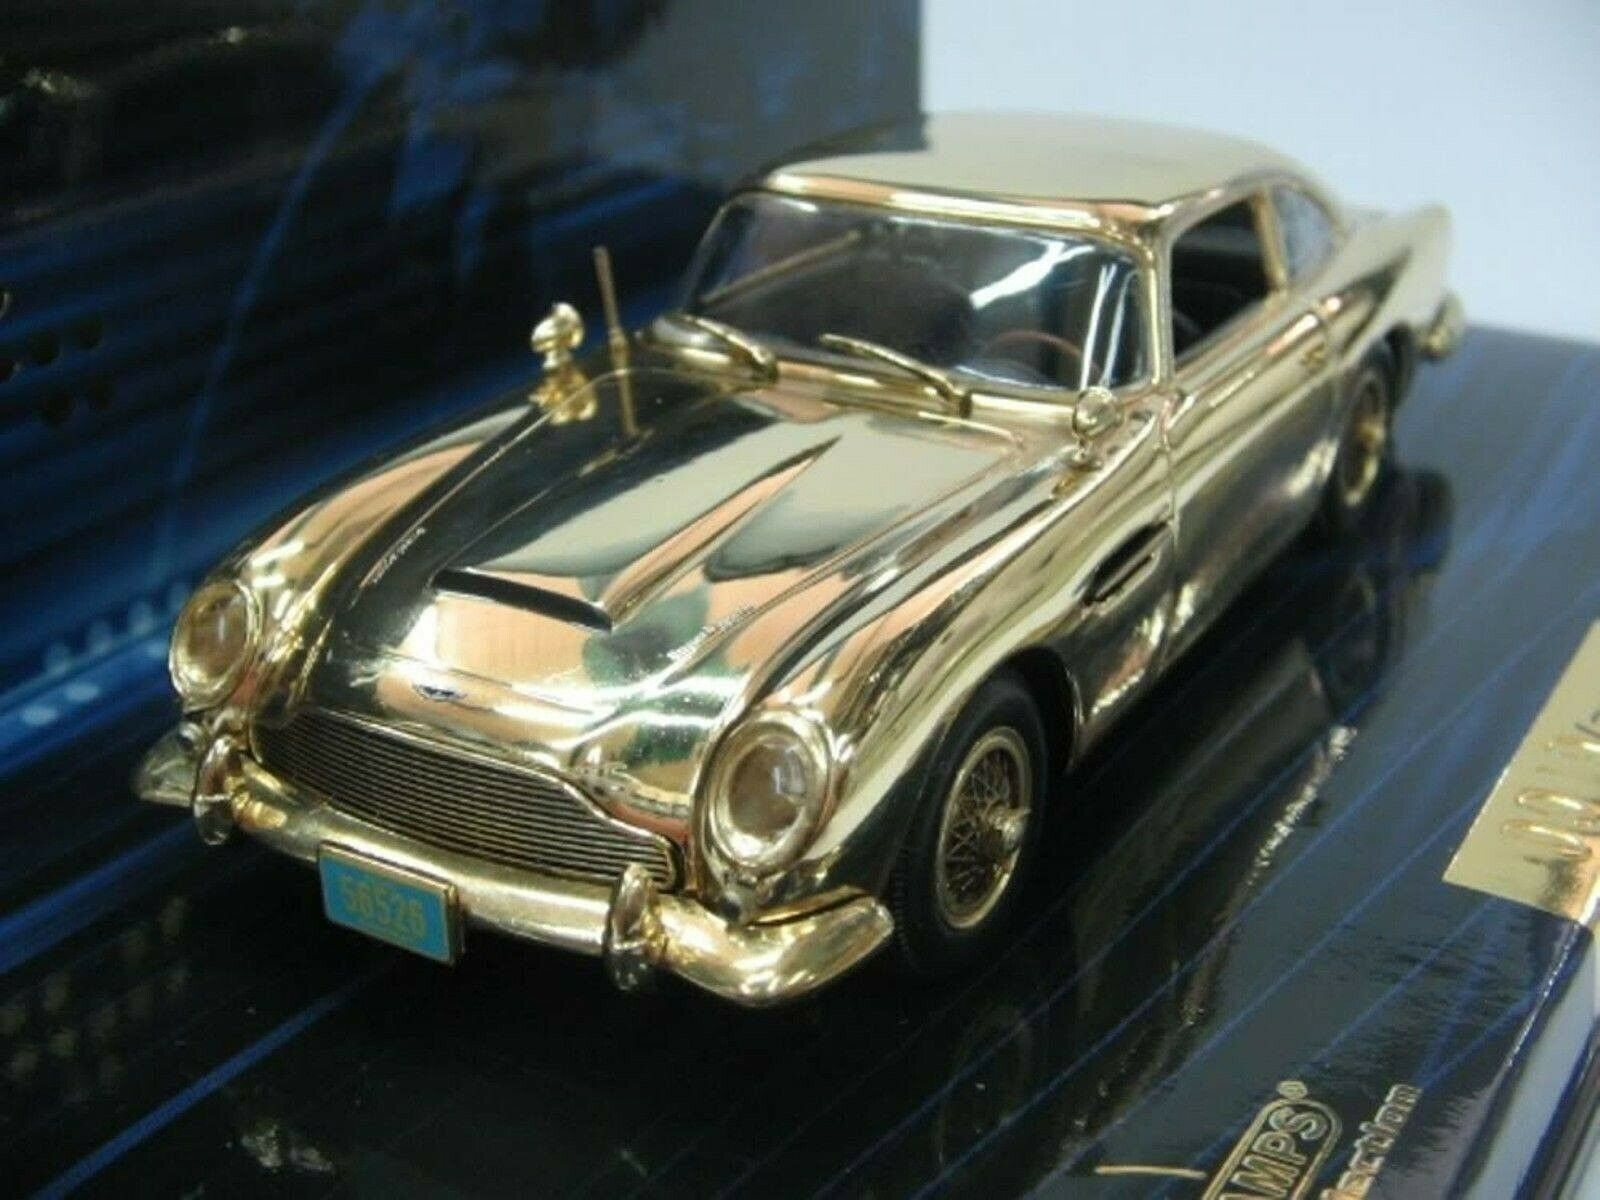 Wow extrêmement rare ASTON MARTIN DB5 Or J BOND Casino royale 1 43 Minichamps